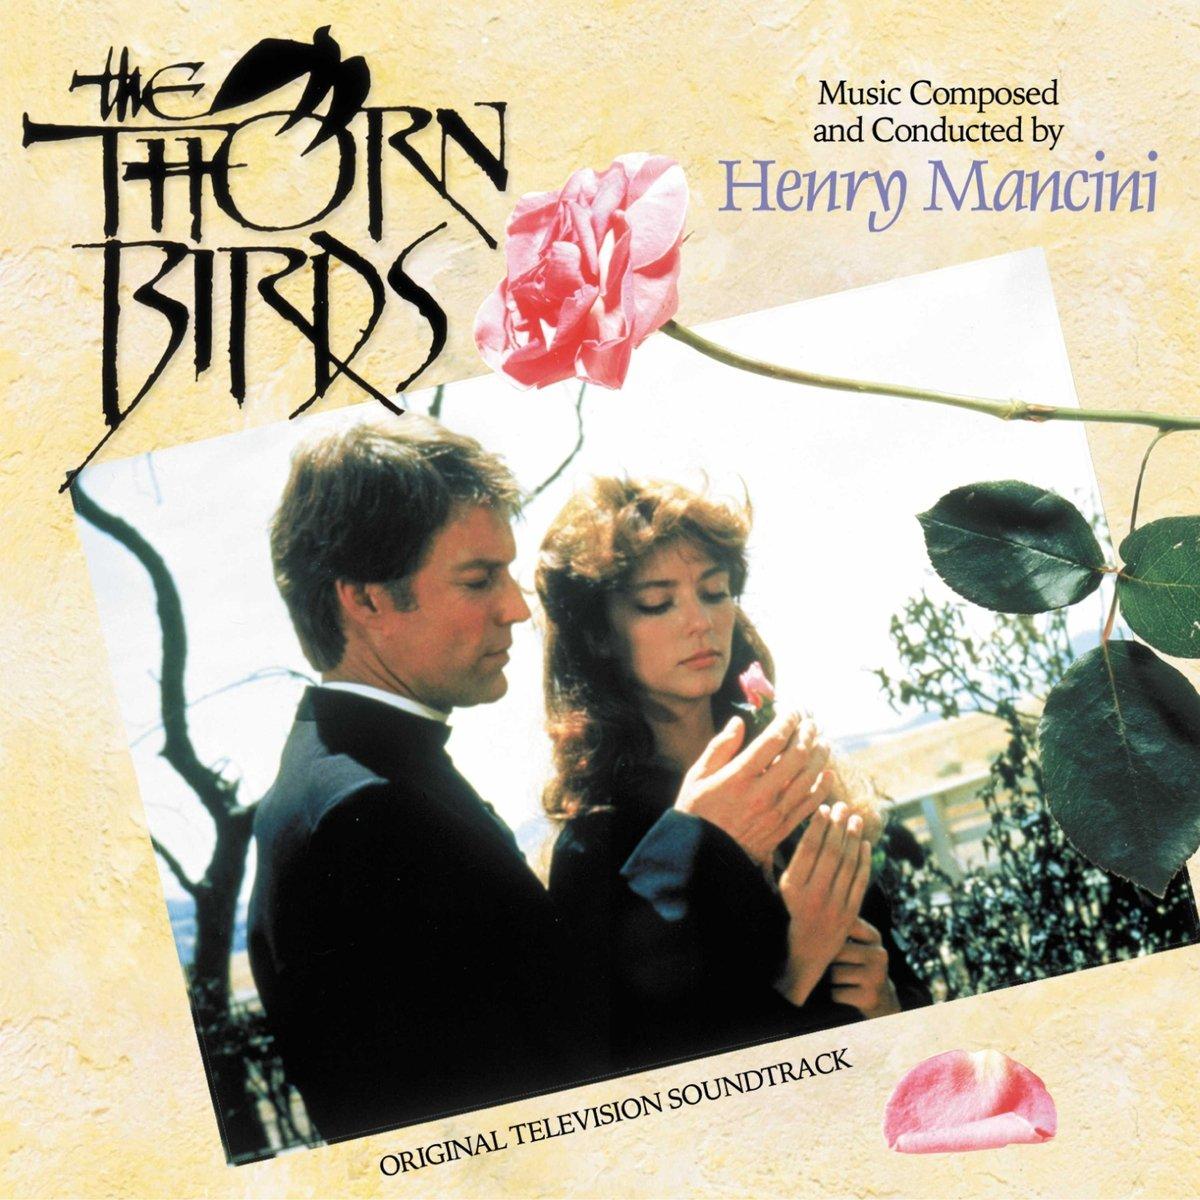 Thorn Birds (Henry Mancini) [2 CD]